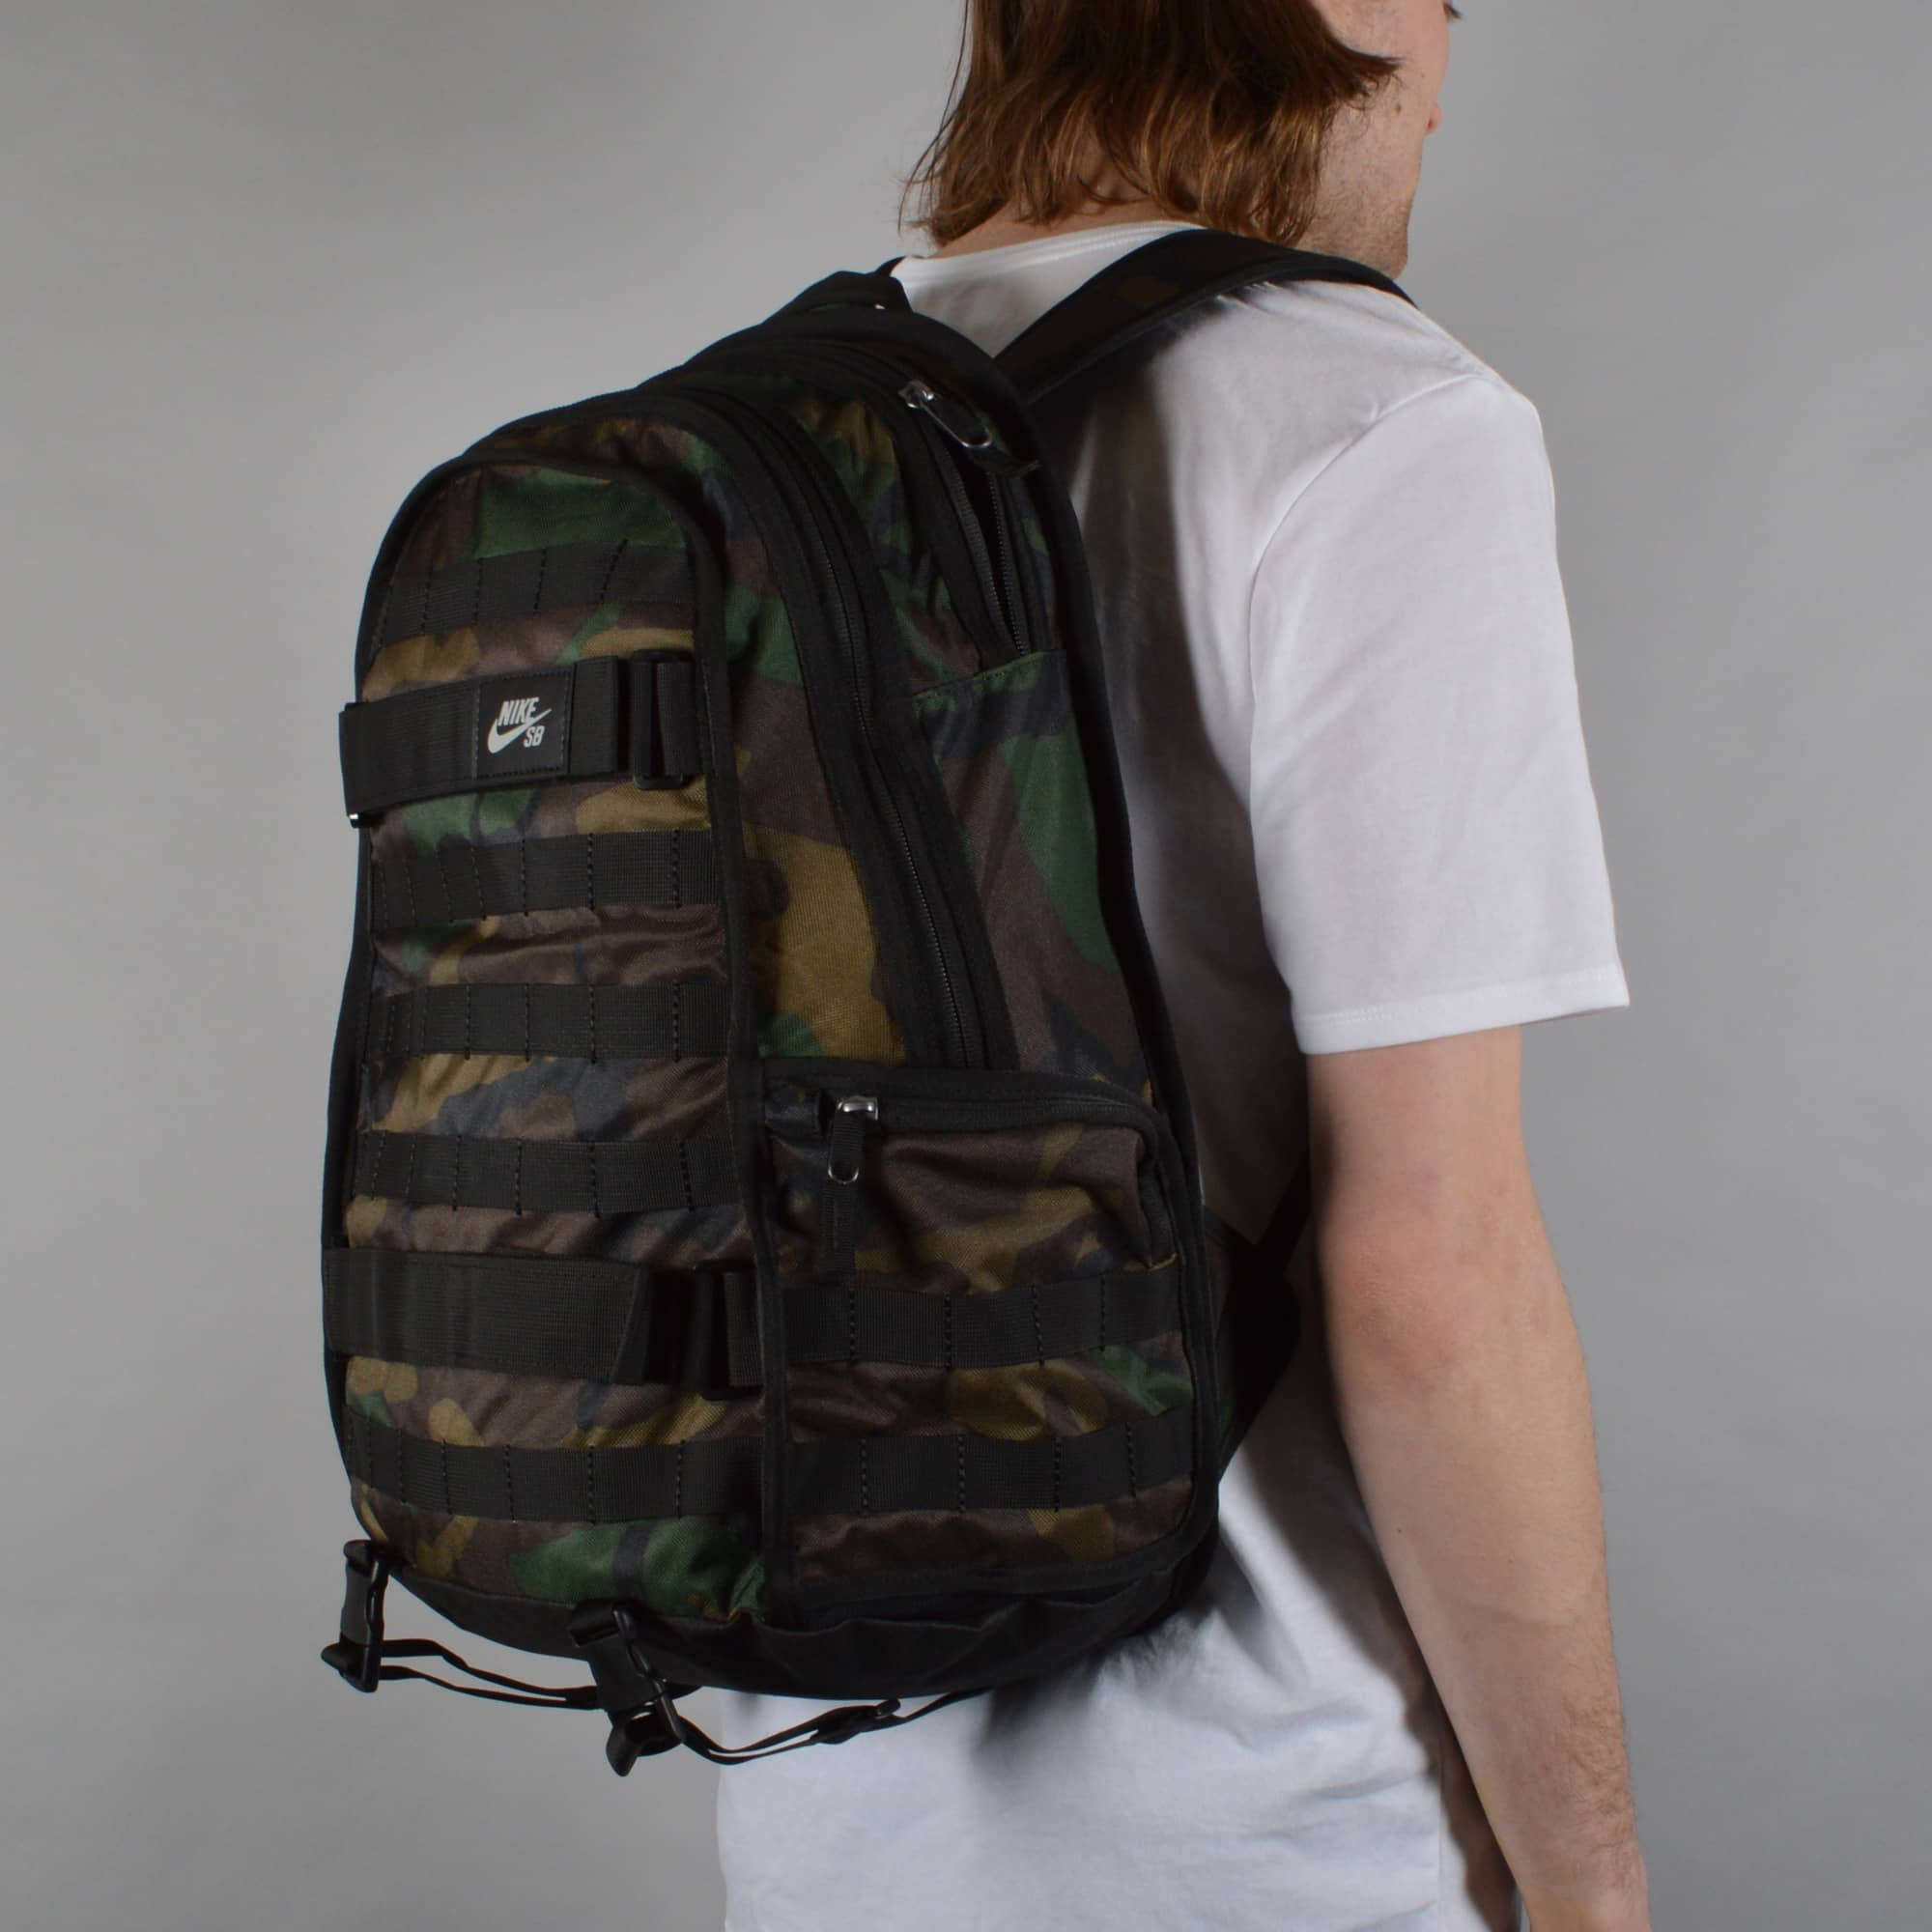 Nike SB RPM Graphic Skate Backpack